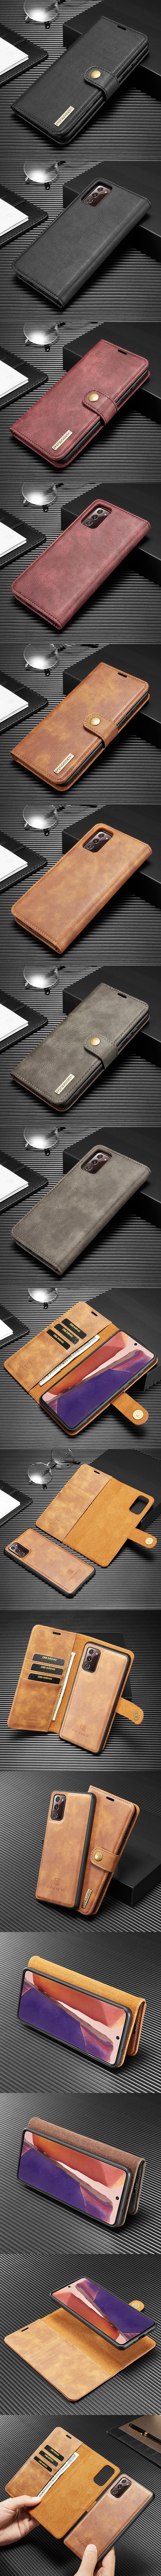 500-Samsung-分離二合一翻蓋書本皮套磁吸固定手機套手機殼背蓋(Note20)